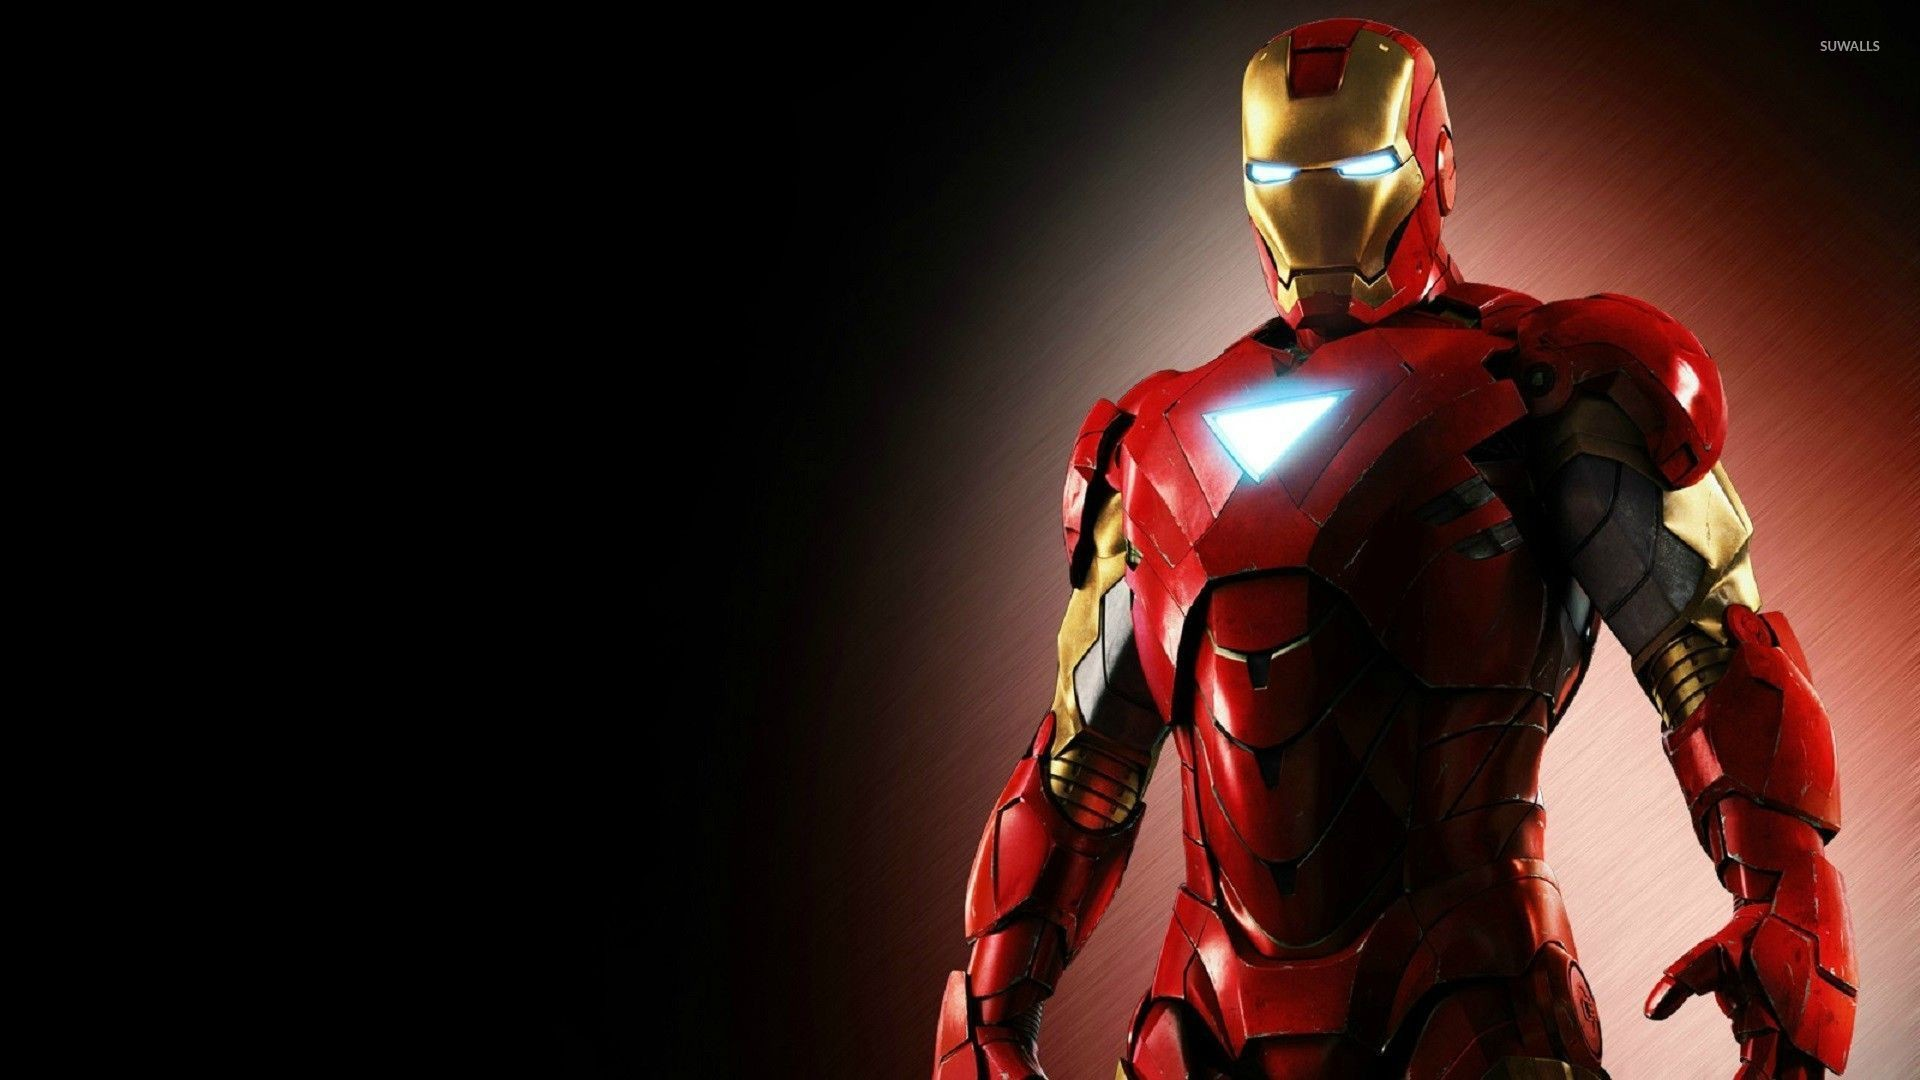 Iron Man Movie Wallpaper ·① WallpaperTag